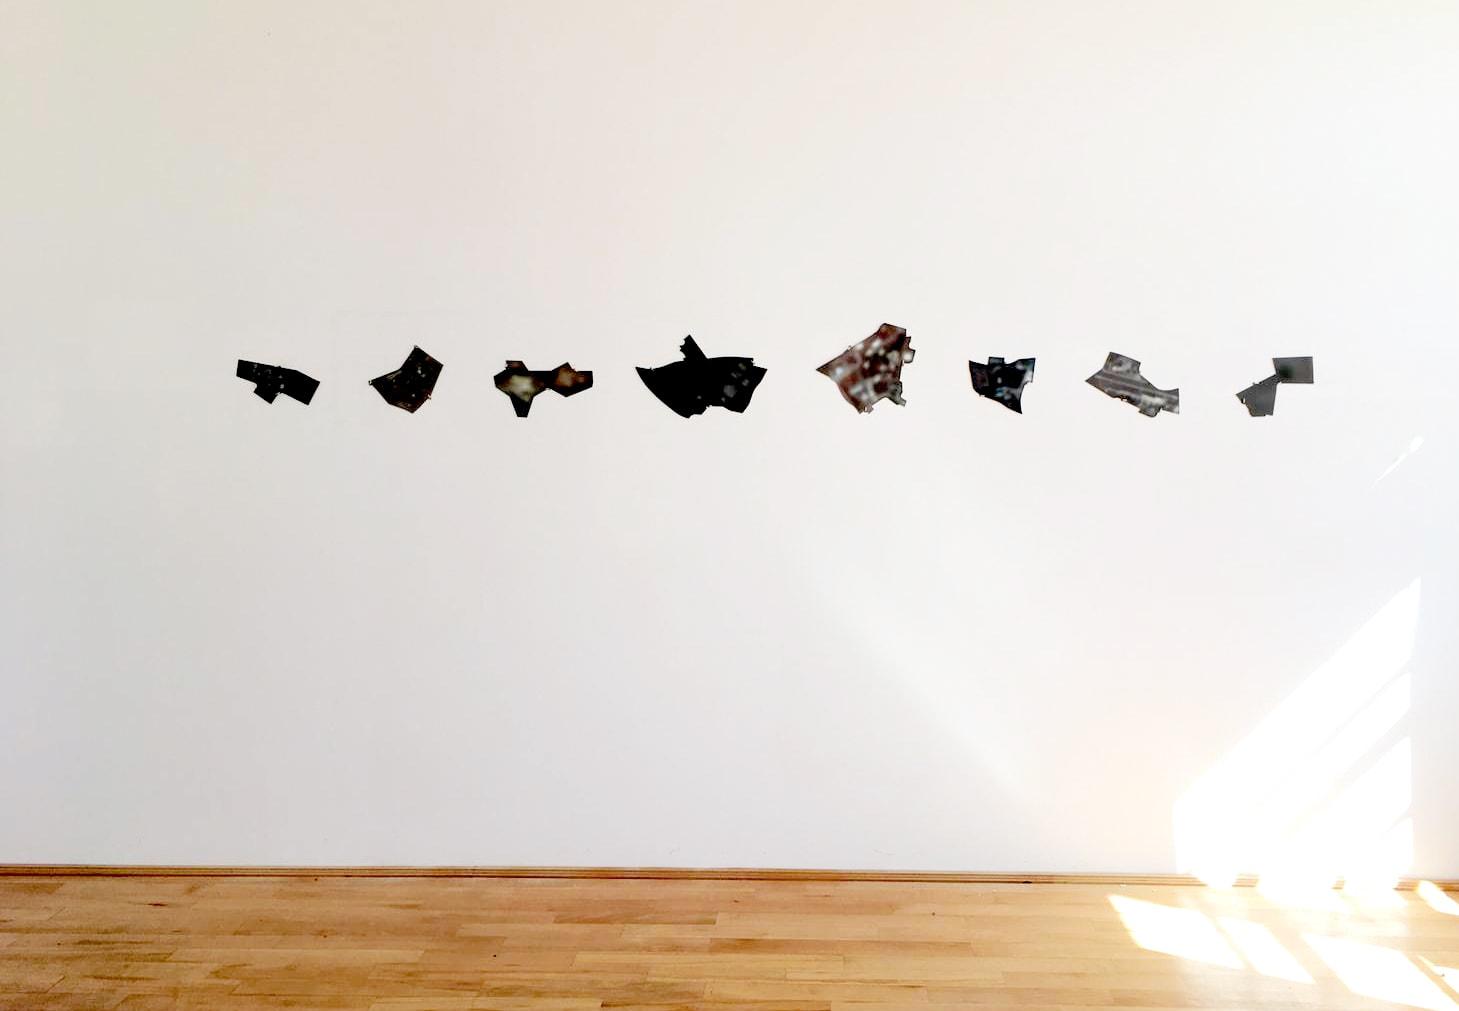 Baran Caginli, Untitle, 8 laser cut photographic prints on aluminum, 2020. Installation view. © Florin Bobu